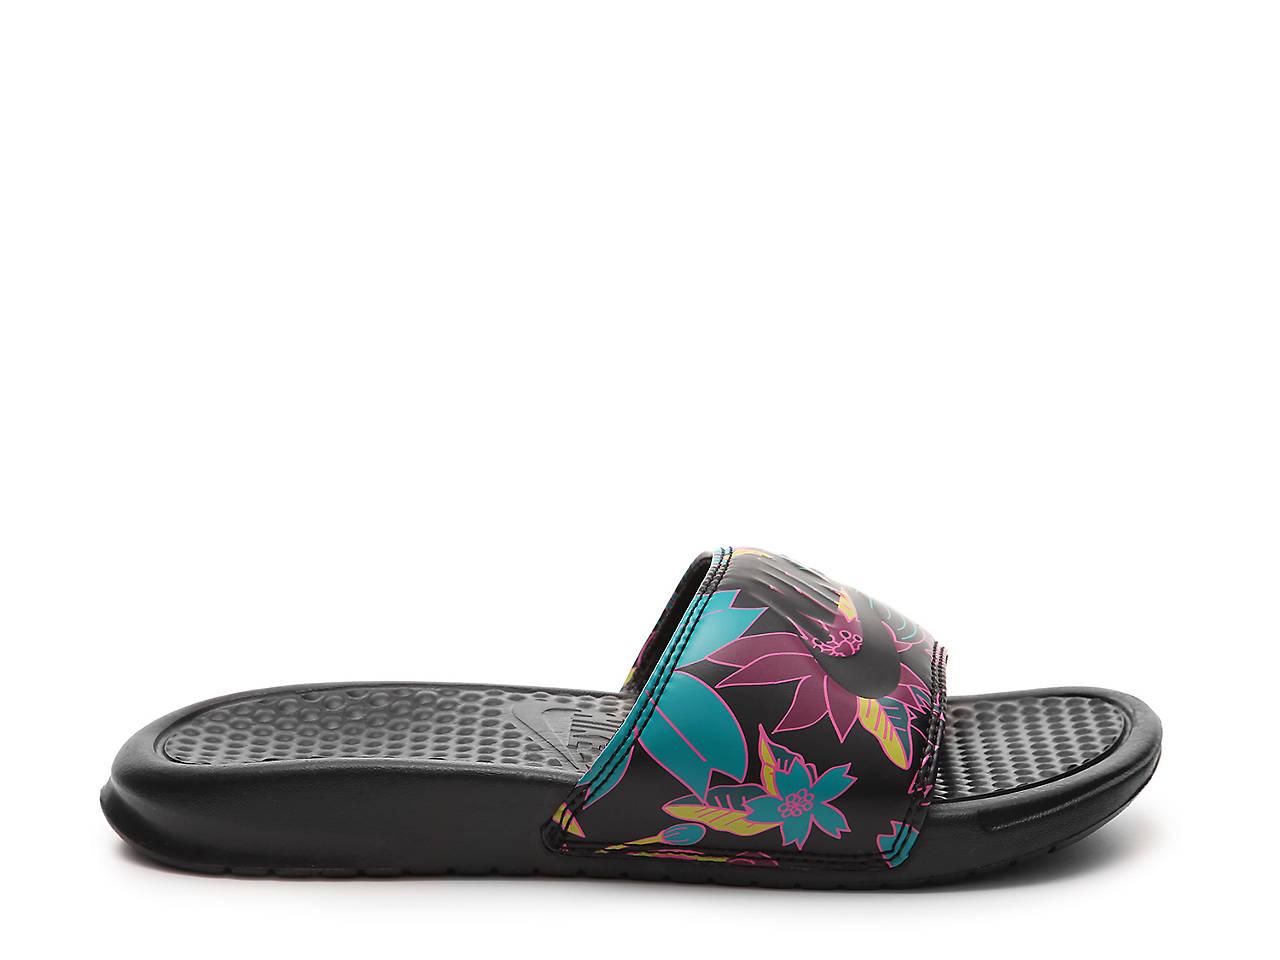 e2bb76ca317de Nike Benassi Just Do It Slide Sandal - Women s Women s Shoes